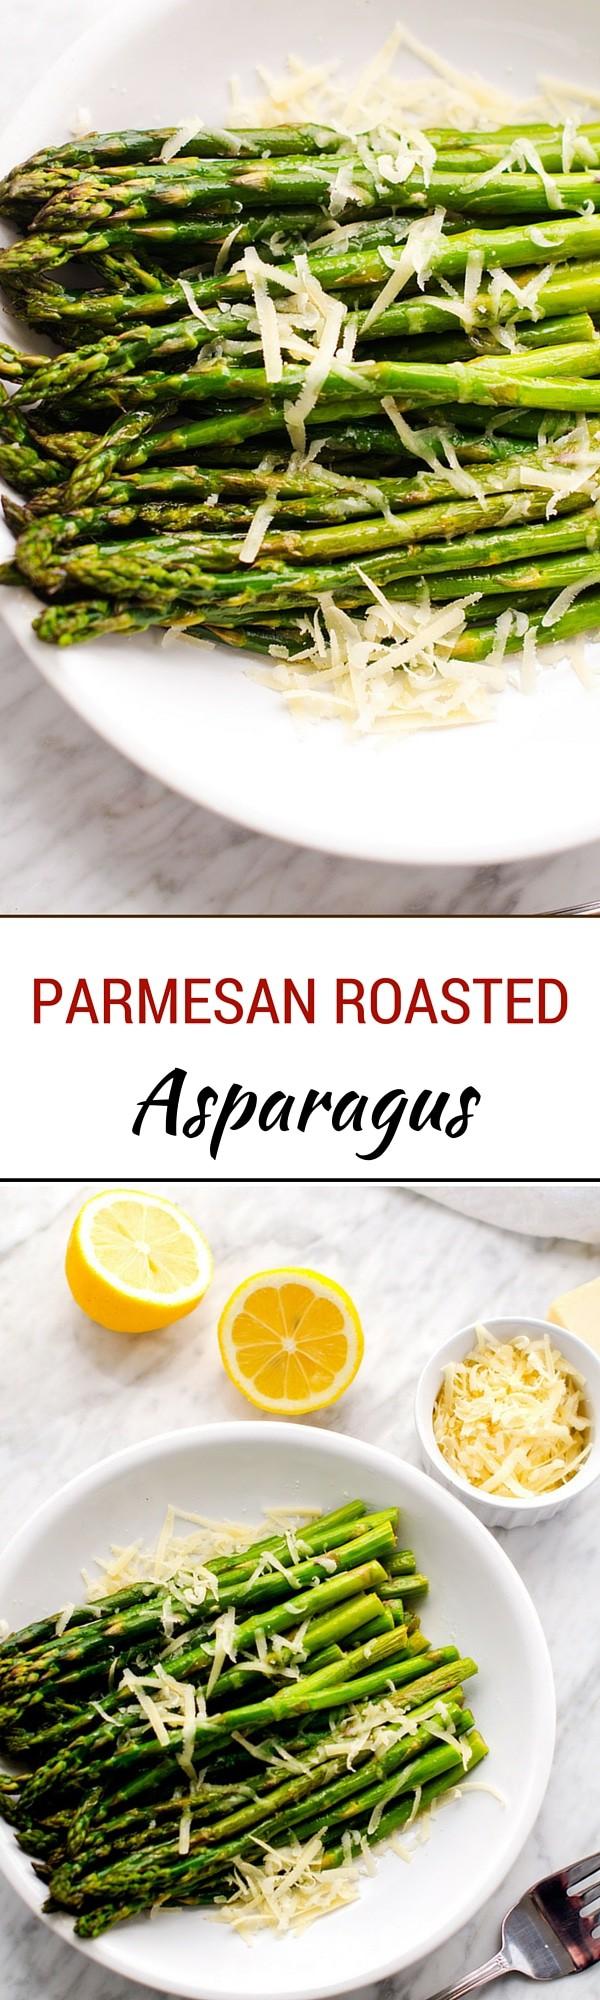 Parmesan Roasted Asparagus - WendyPolisi.com